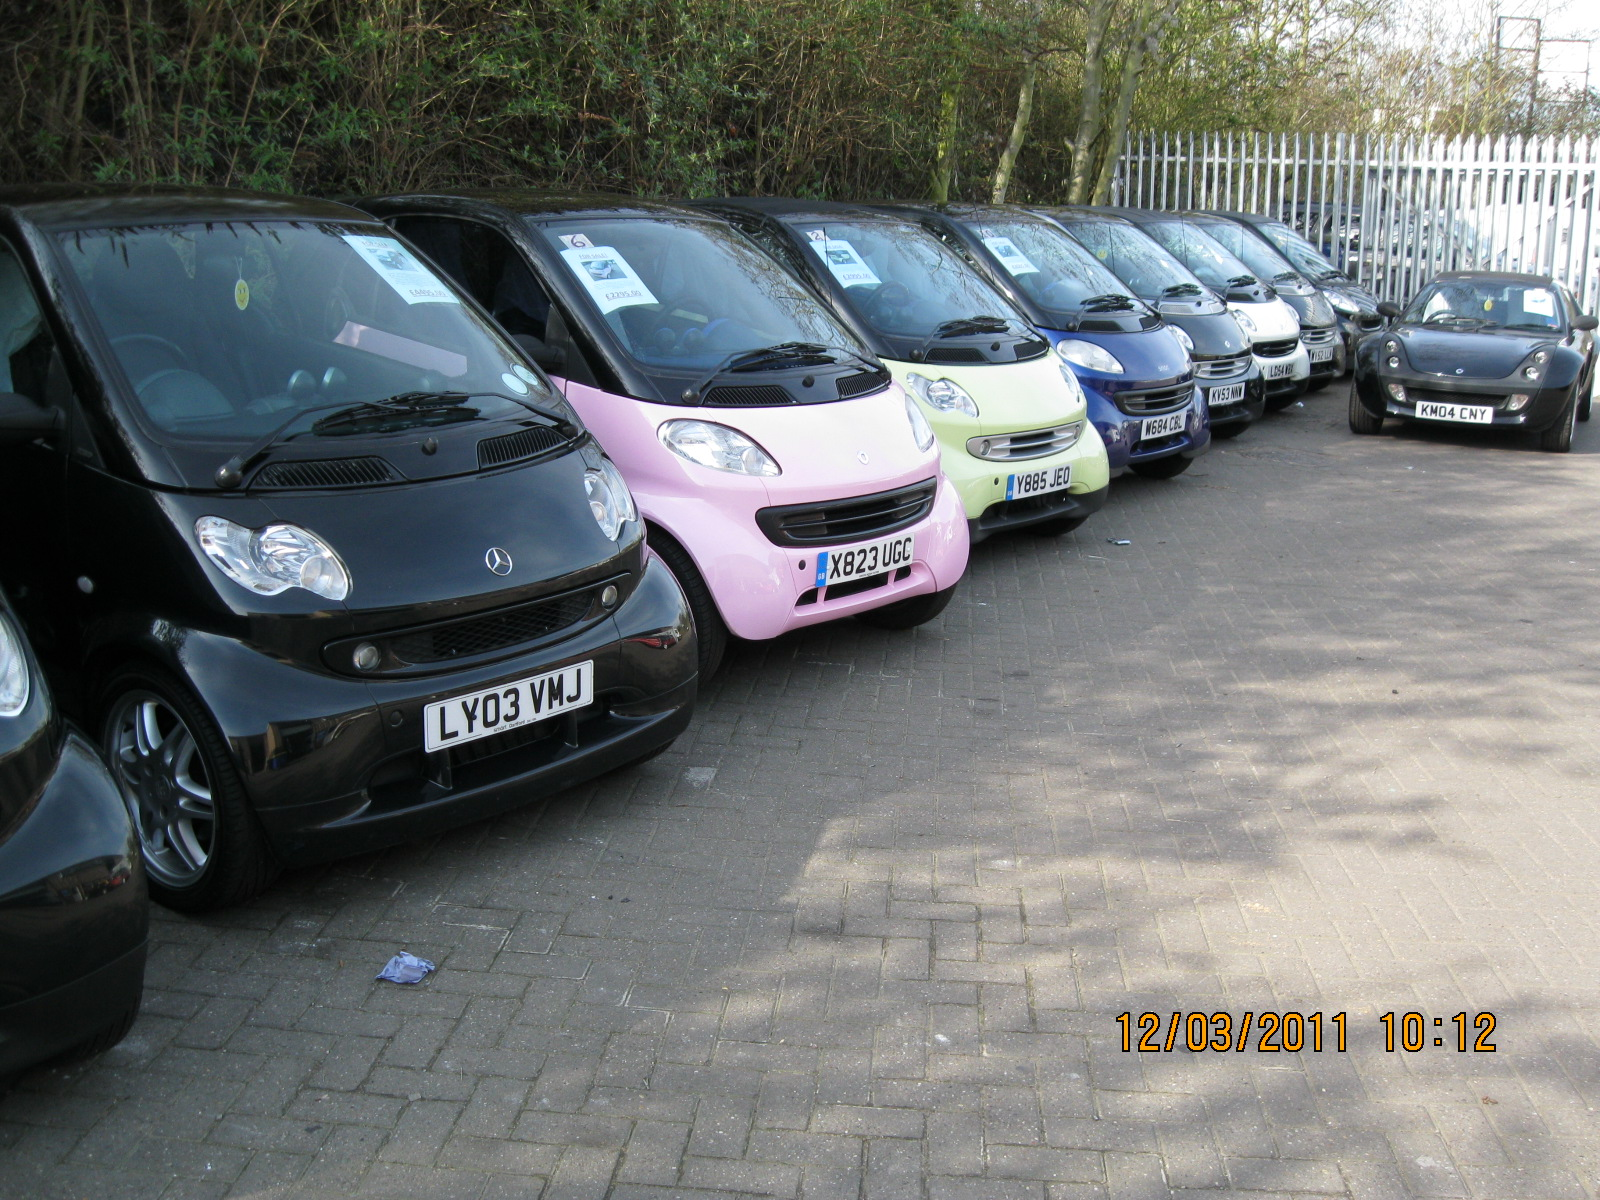 Used Smart Cars For Sale Kent | Smart Car Engines Servicing | Smart ...